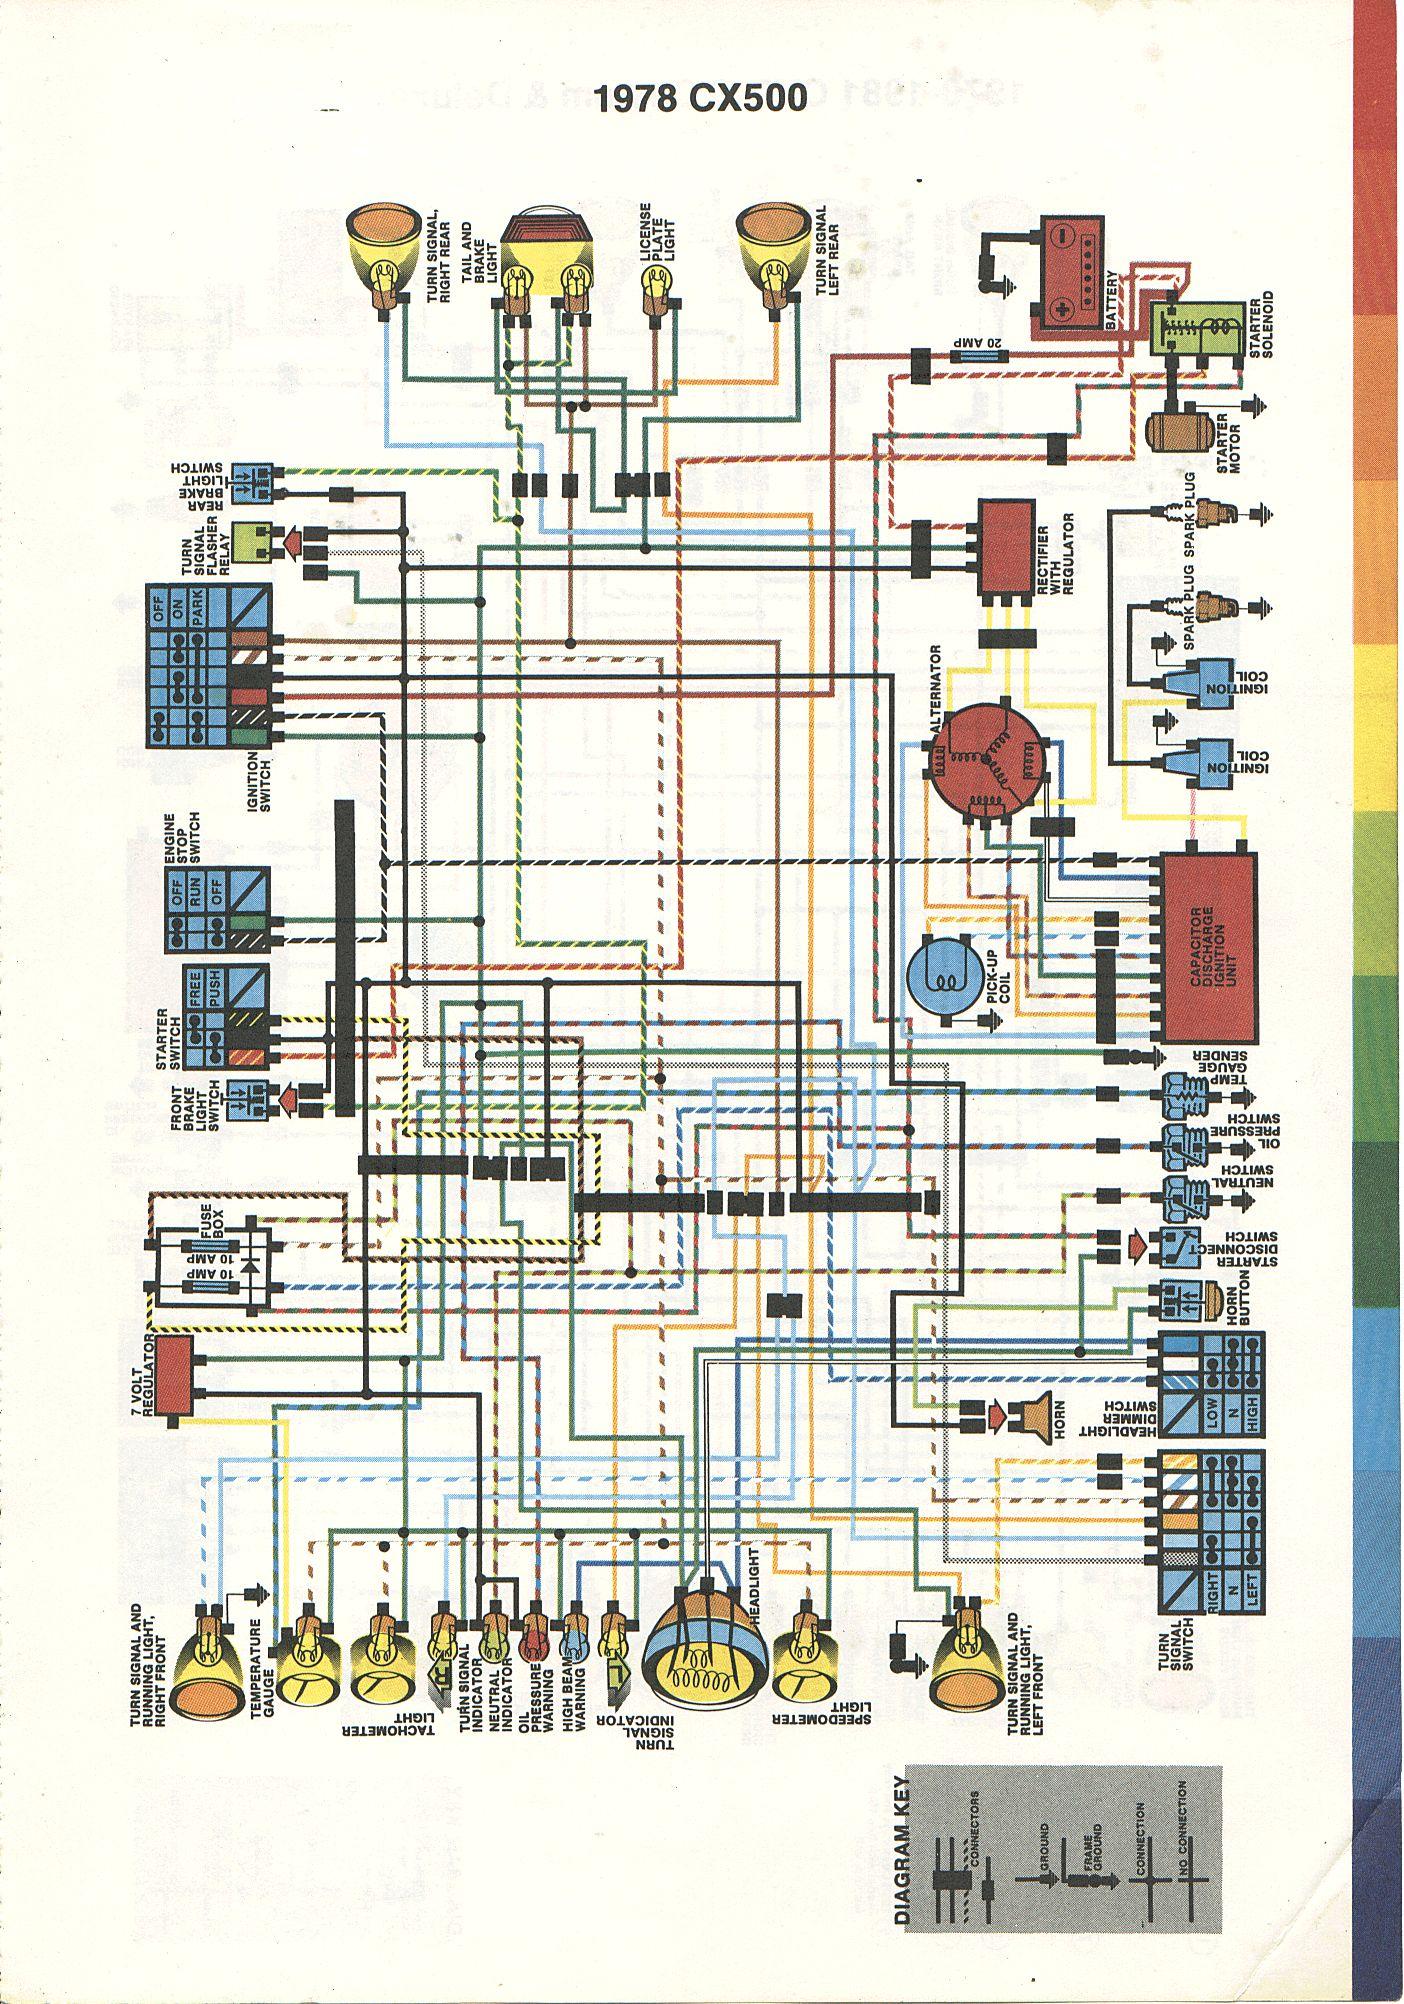 1980 Honda Cx500 Wiring Diagram - Wiring Diagram Car Voltage Regulator -  pipiing.tukune.jeanjaures37.fr | 1980 Honda Cx500 Wiring Diagram |  | Wiring Diagram Resource